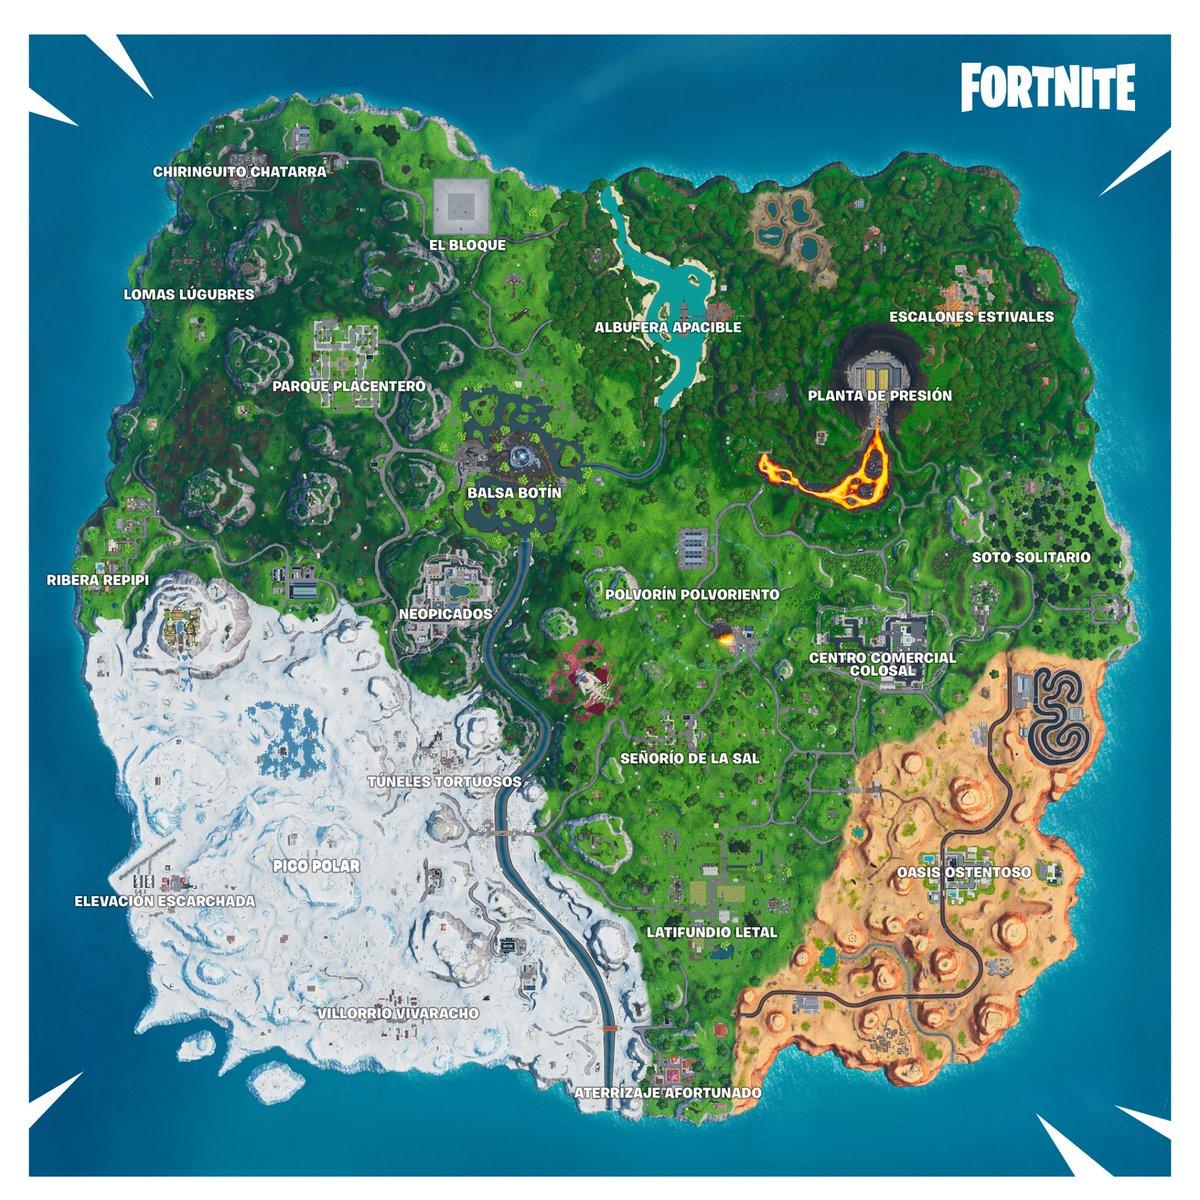 Mapa Fortnite Temporada 1.Fortnite Brleaks Es On Twitter Mapa De La Temporada